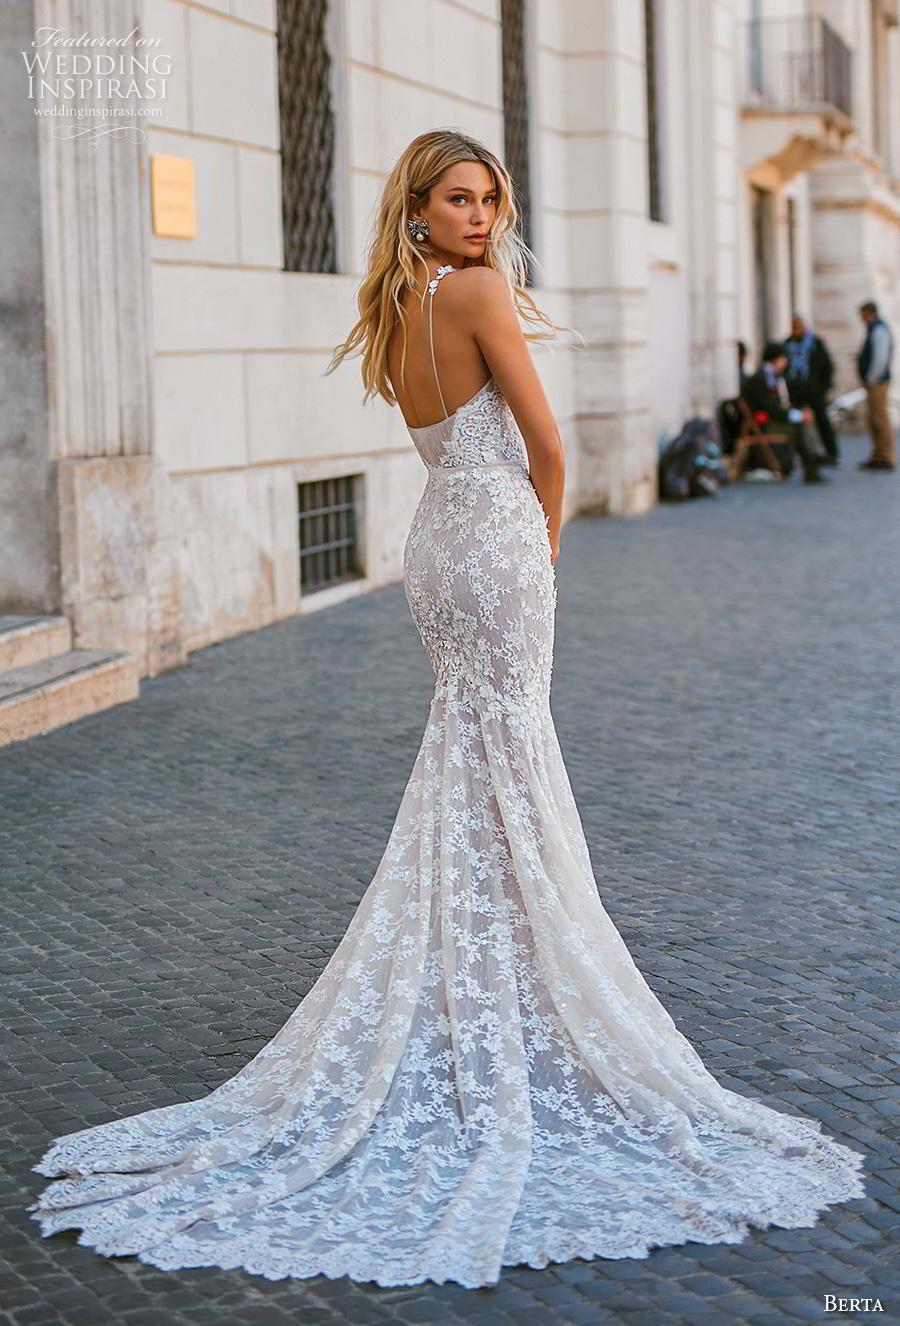 Weddinginspirasi Com Featuring Berta 2020 Privee Bridal Sleeveless Spaghetti Strap Sweethe Lace Mermaid Wedding Dress Lace Bridal Gown Backless Wedding Dress [ 1326 x 900 Pixel ]